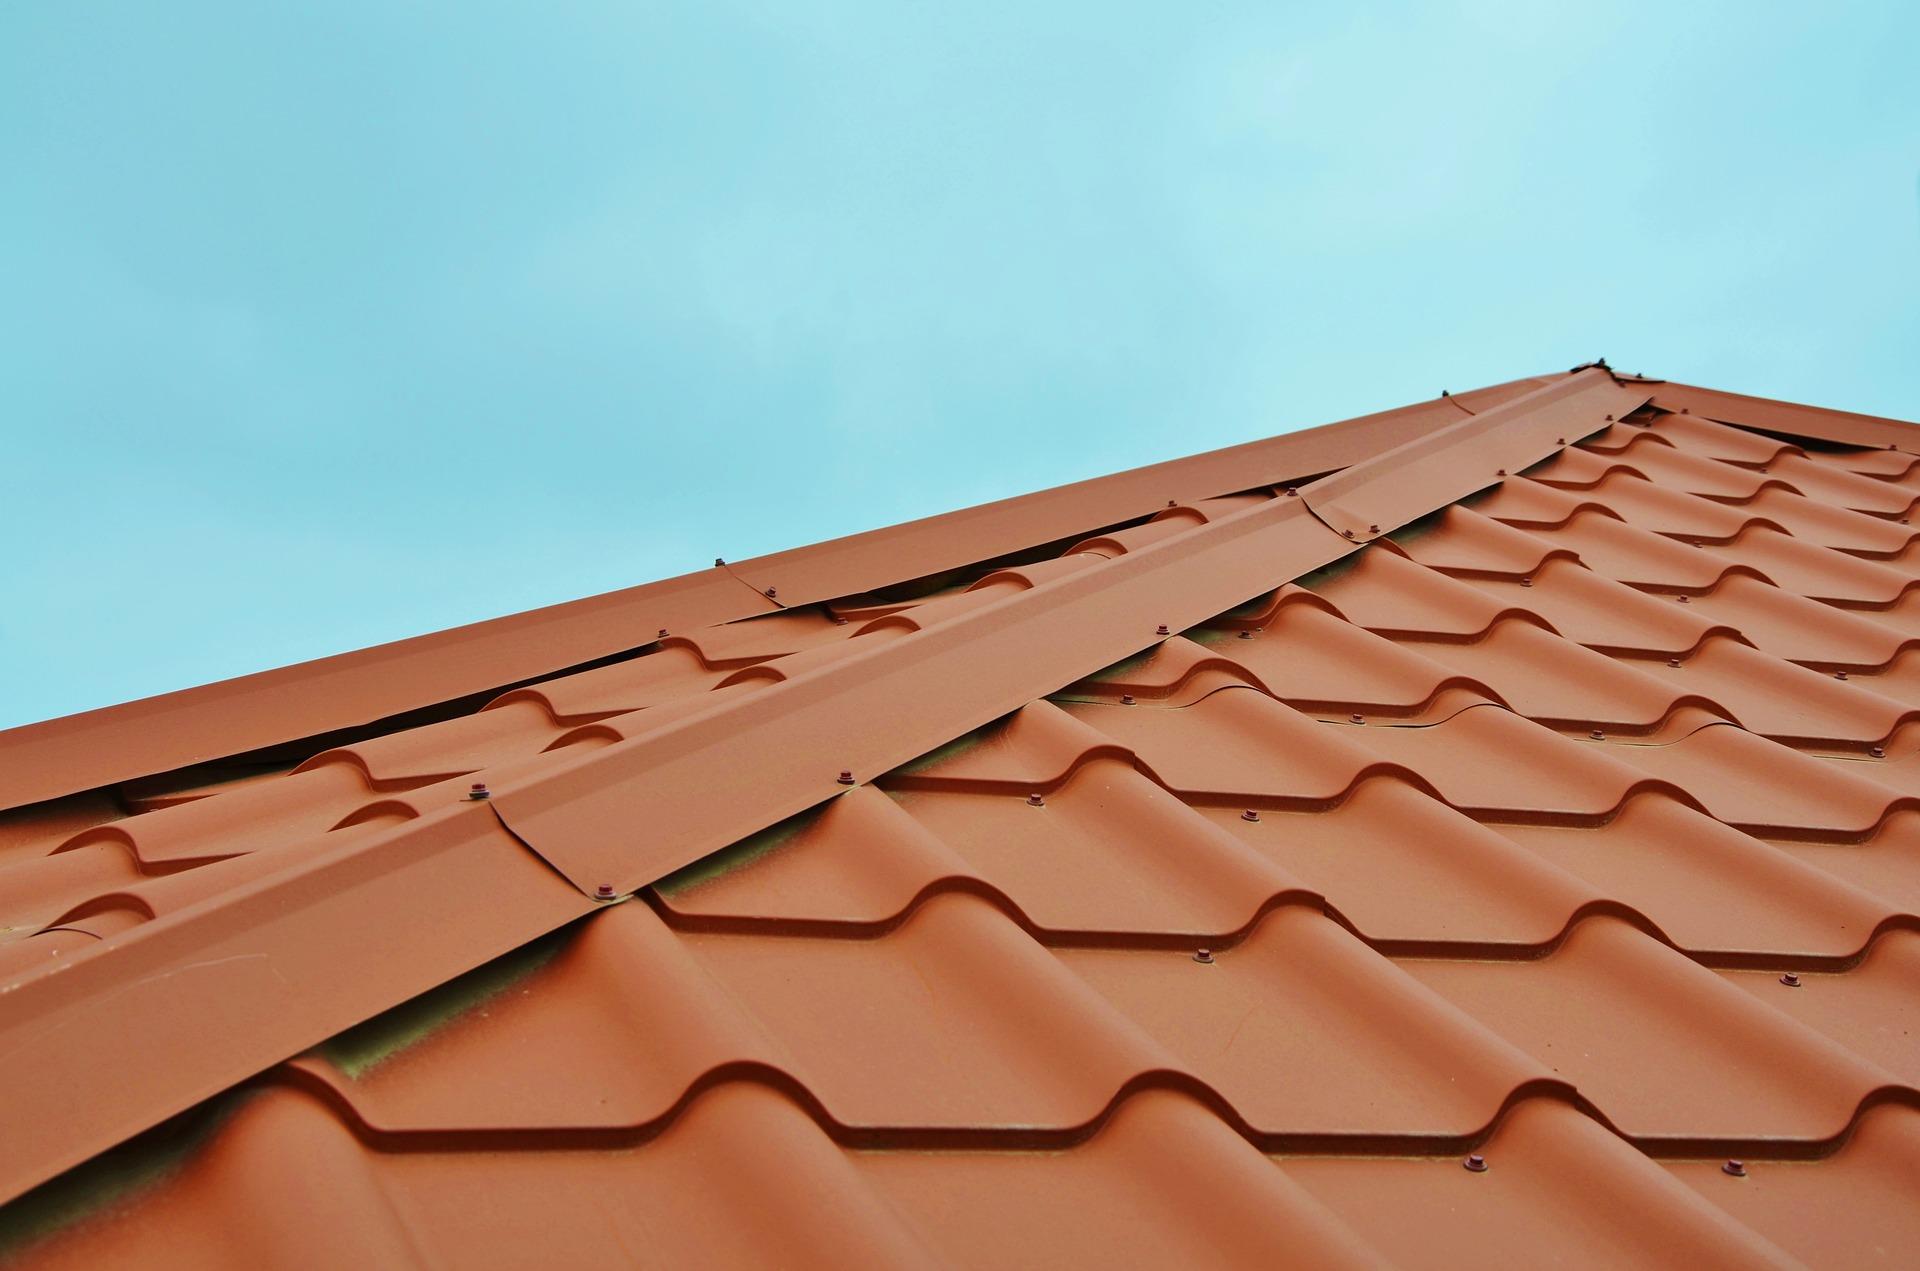 Traitement des toitures